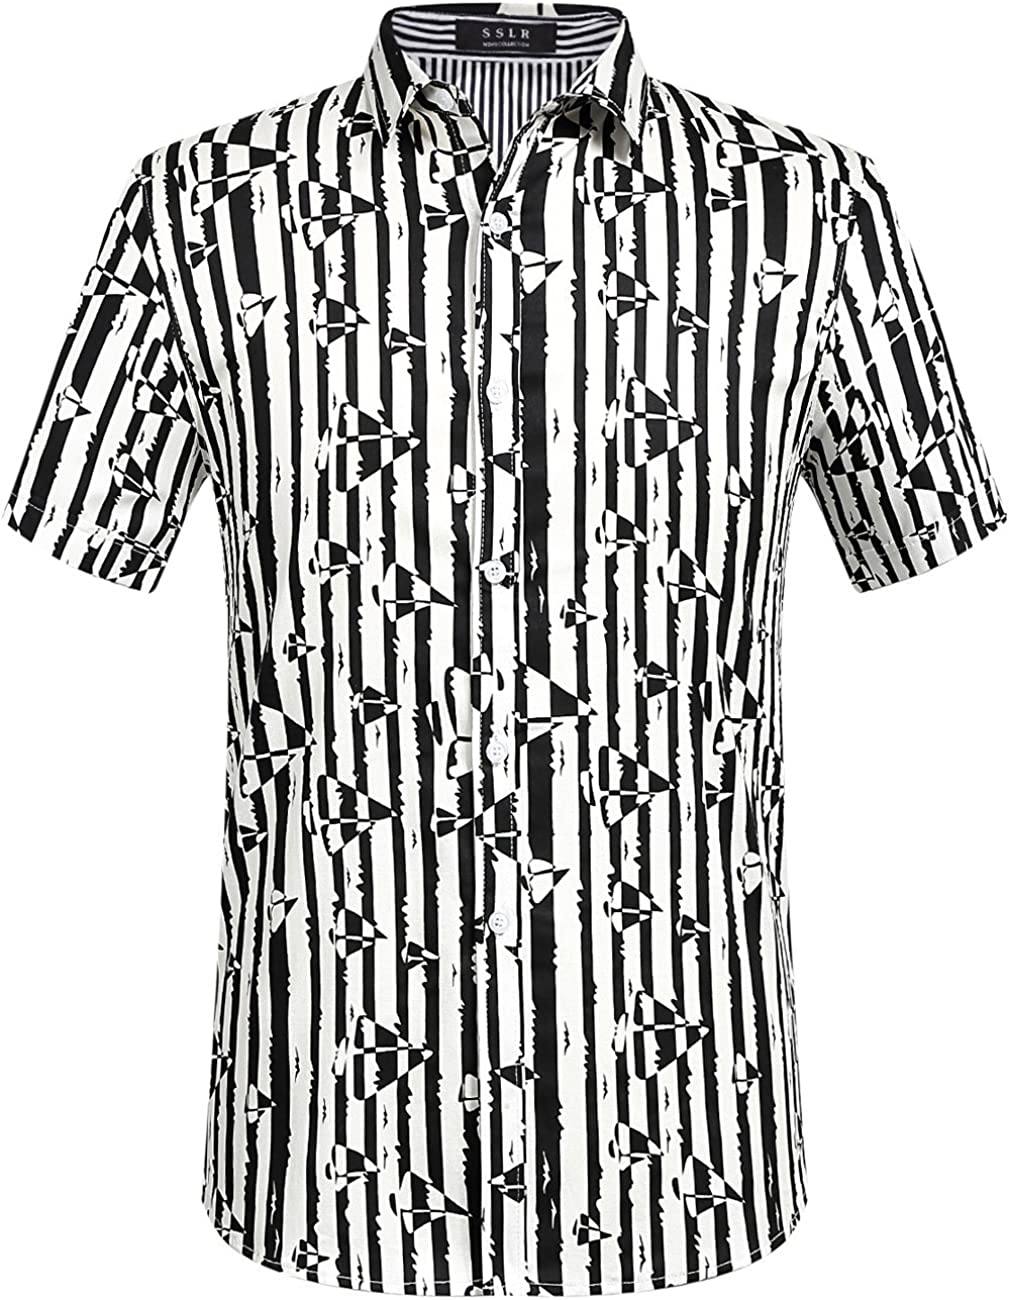 SSLR Mens Short Sleeve Shirts Button Down Casual Aloha Hawaiian Shirts for Men